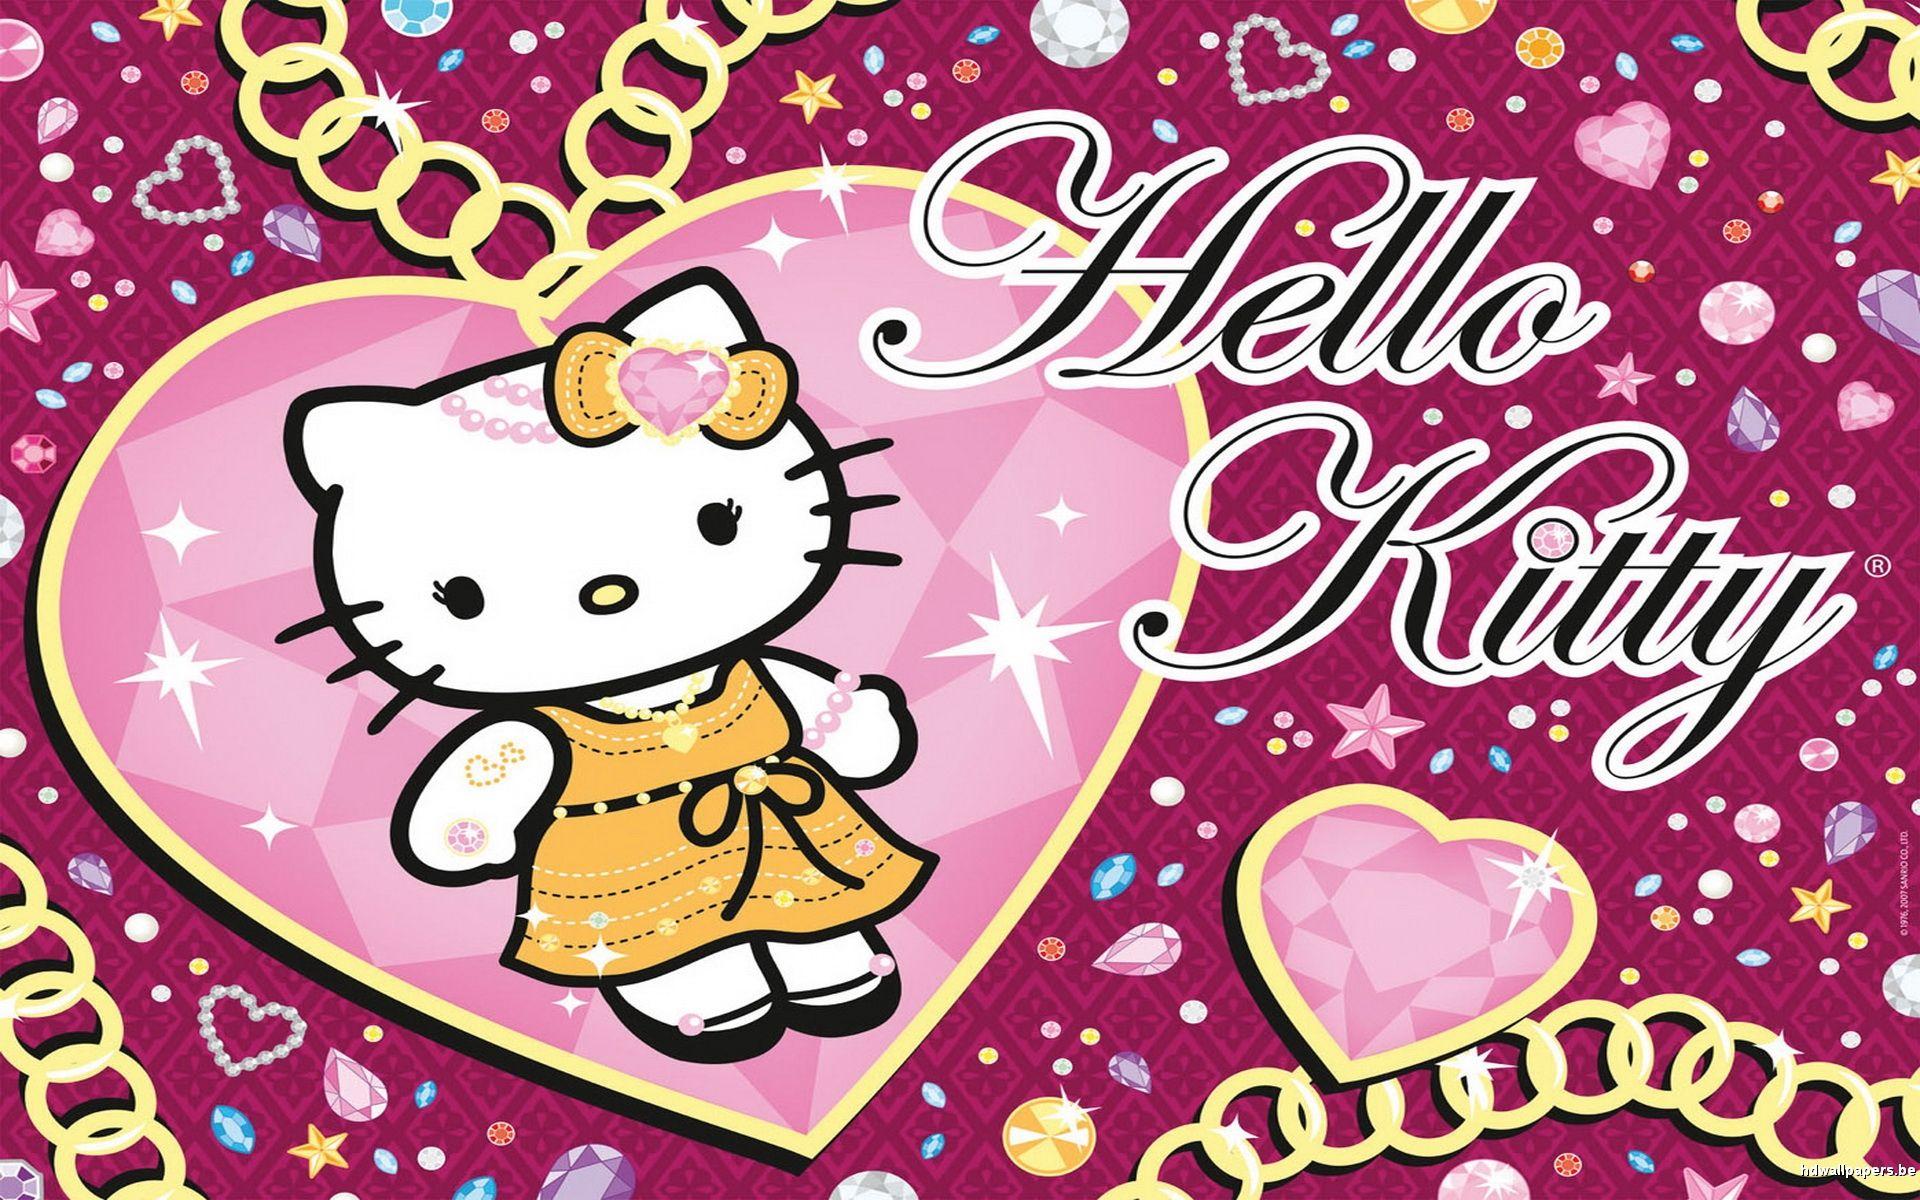 Simple Wallpaper Hello Kitty Desktop Background - 86b9acd8538f95193178d156913c0c67  Collection_292718.jpg